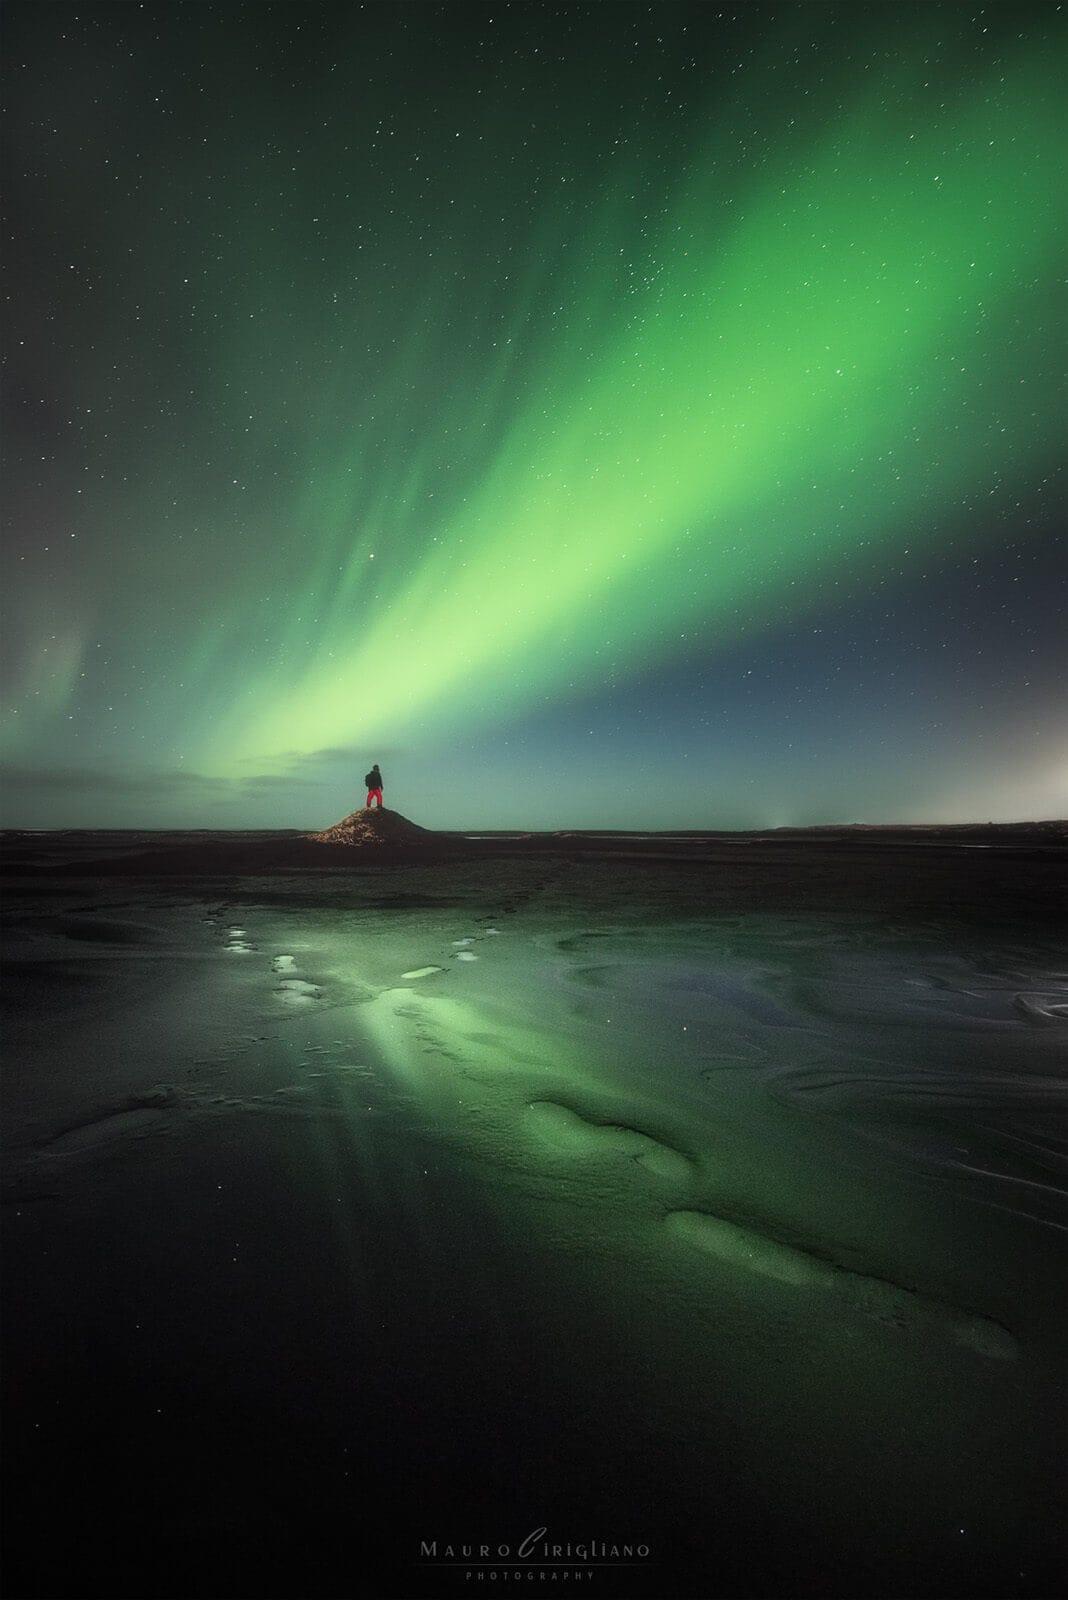 sagoma umana su duna che osserva aurora boreale in islanda